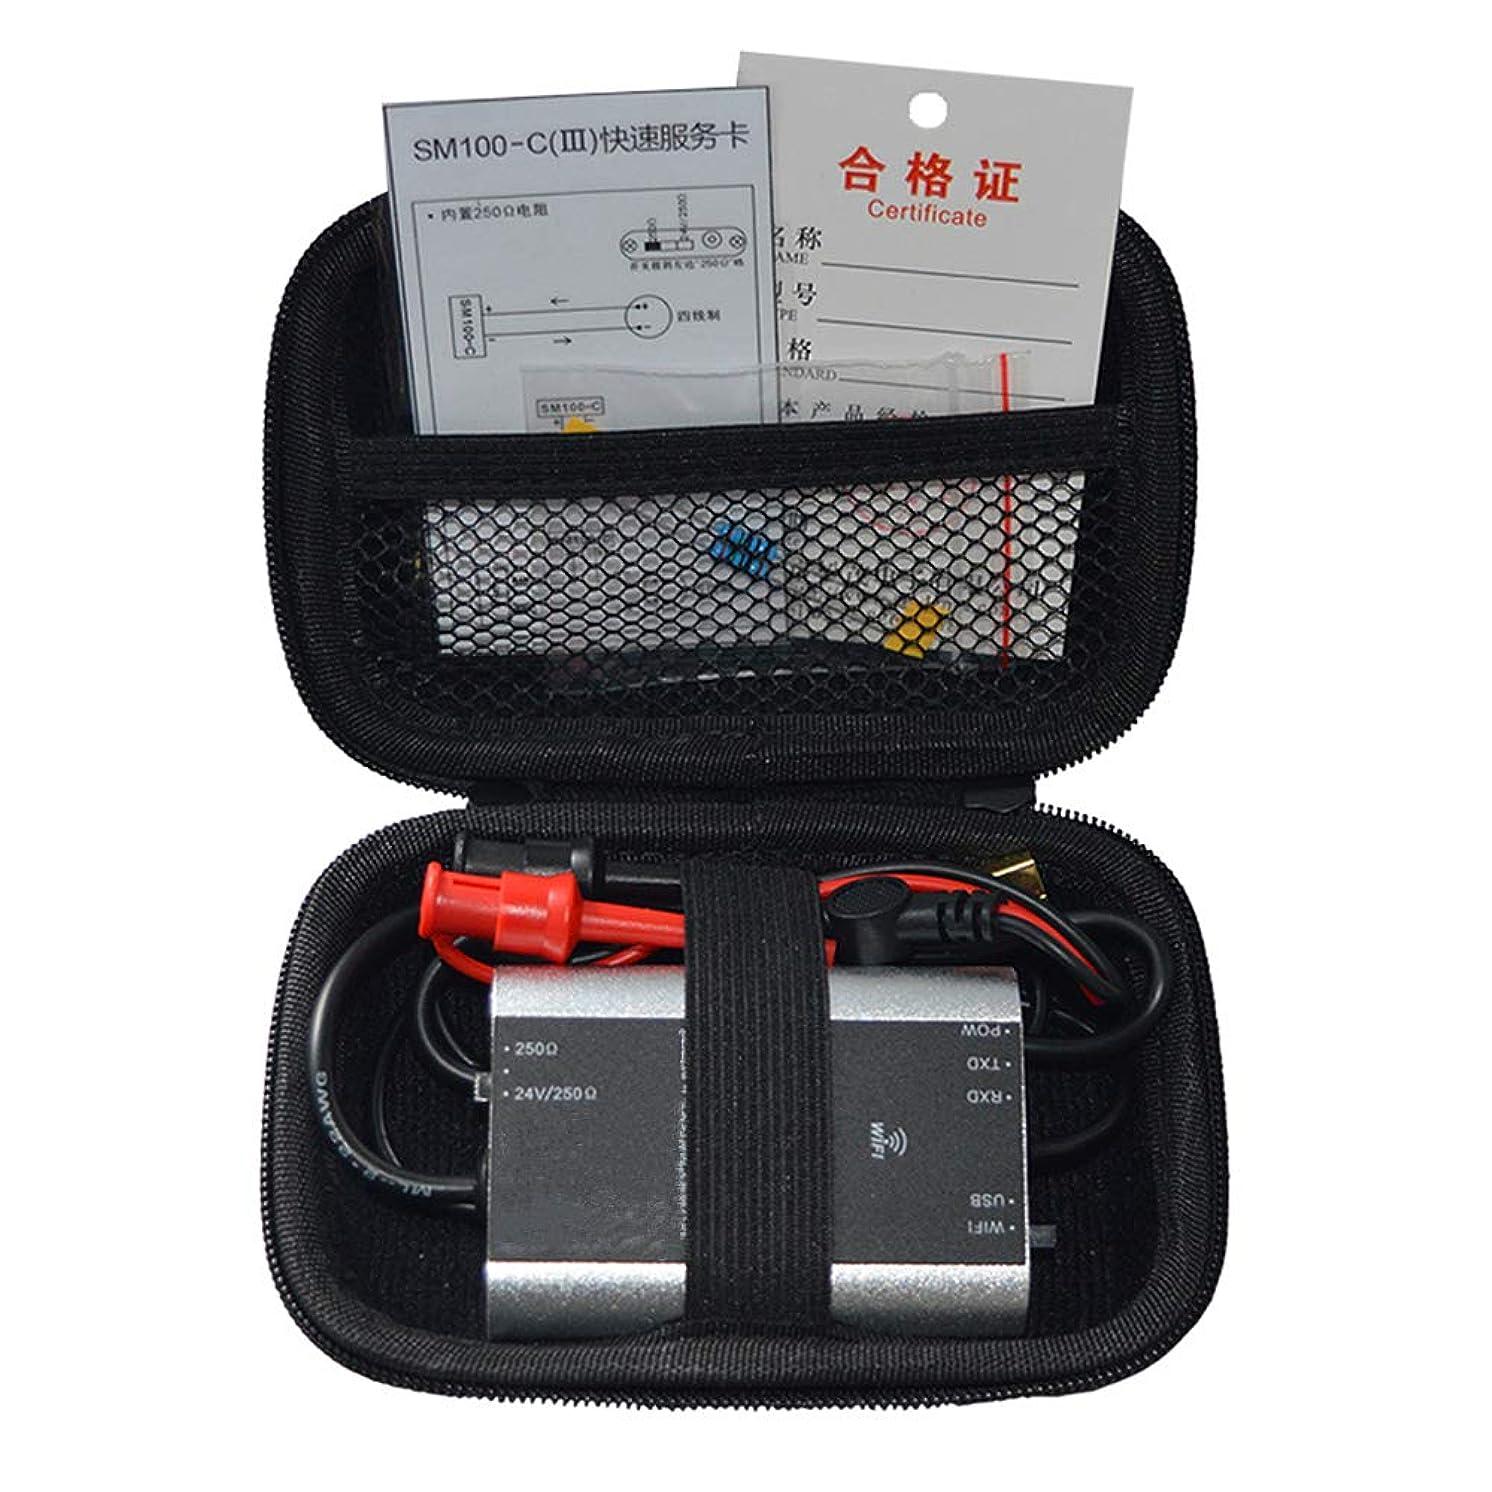 USB Hart Modem HART Converter with WiFi Hart to USB HART Modem Built-in 24V Power + Resistor (WiFi)